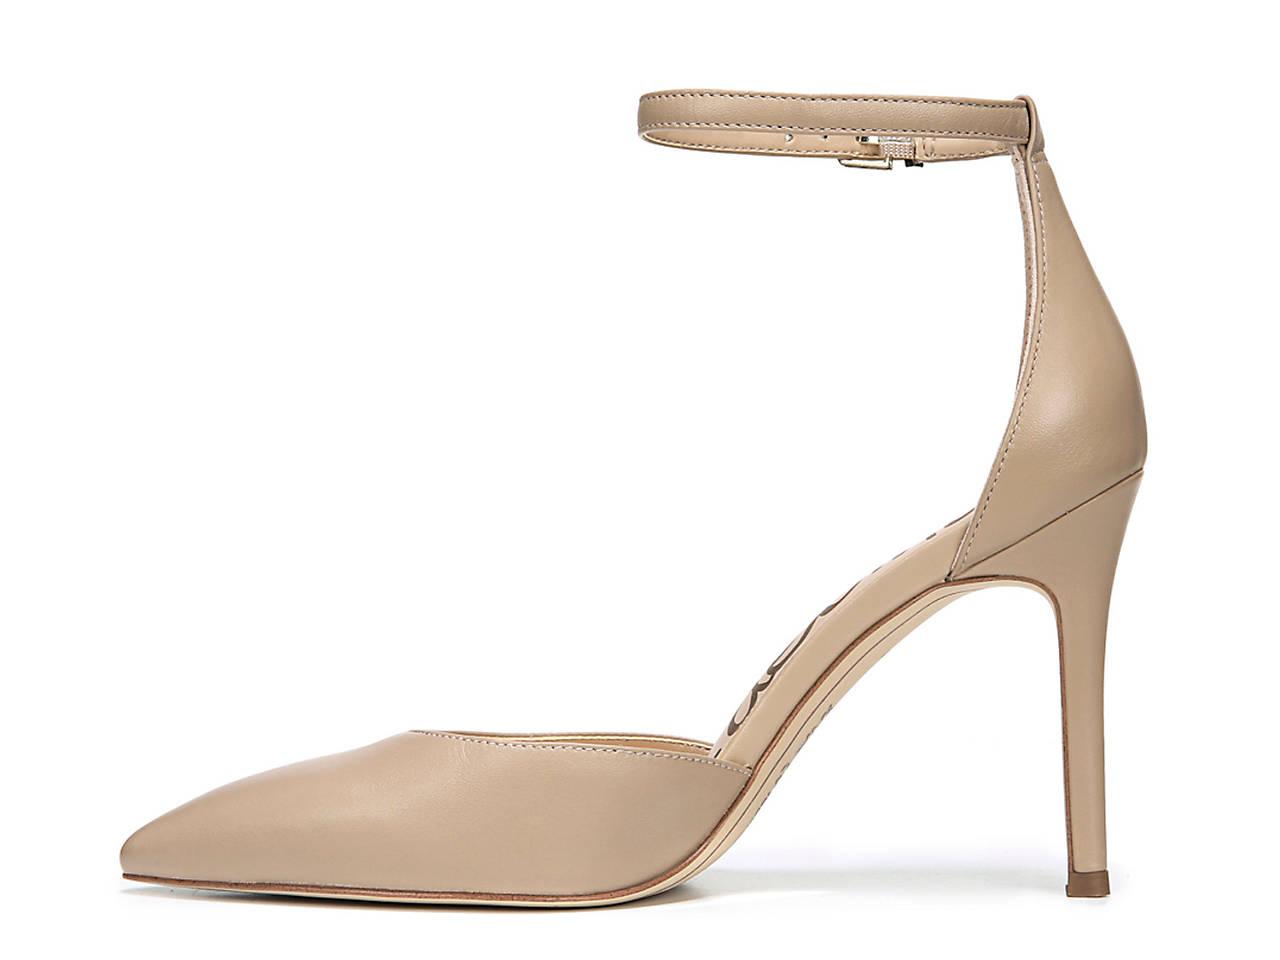 fdef4a0a3e93 Sam Edelman Harlow Pump Women's Shoes | DSW